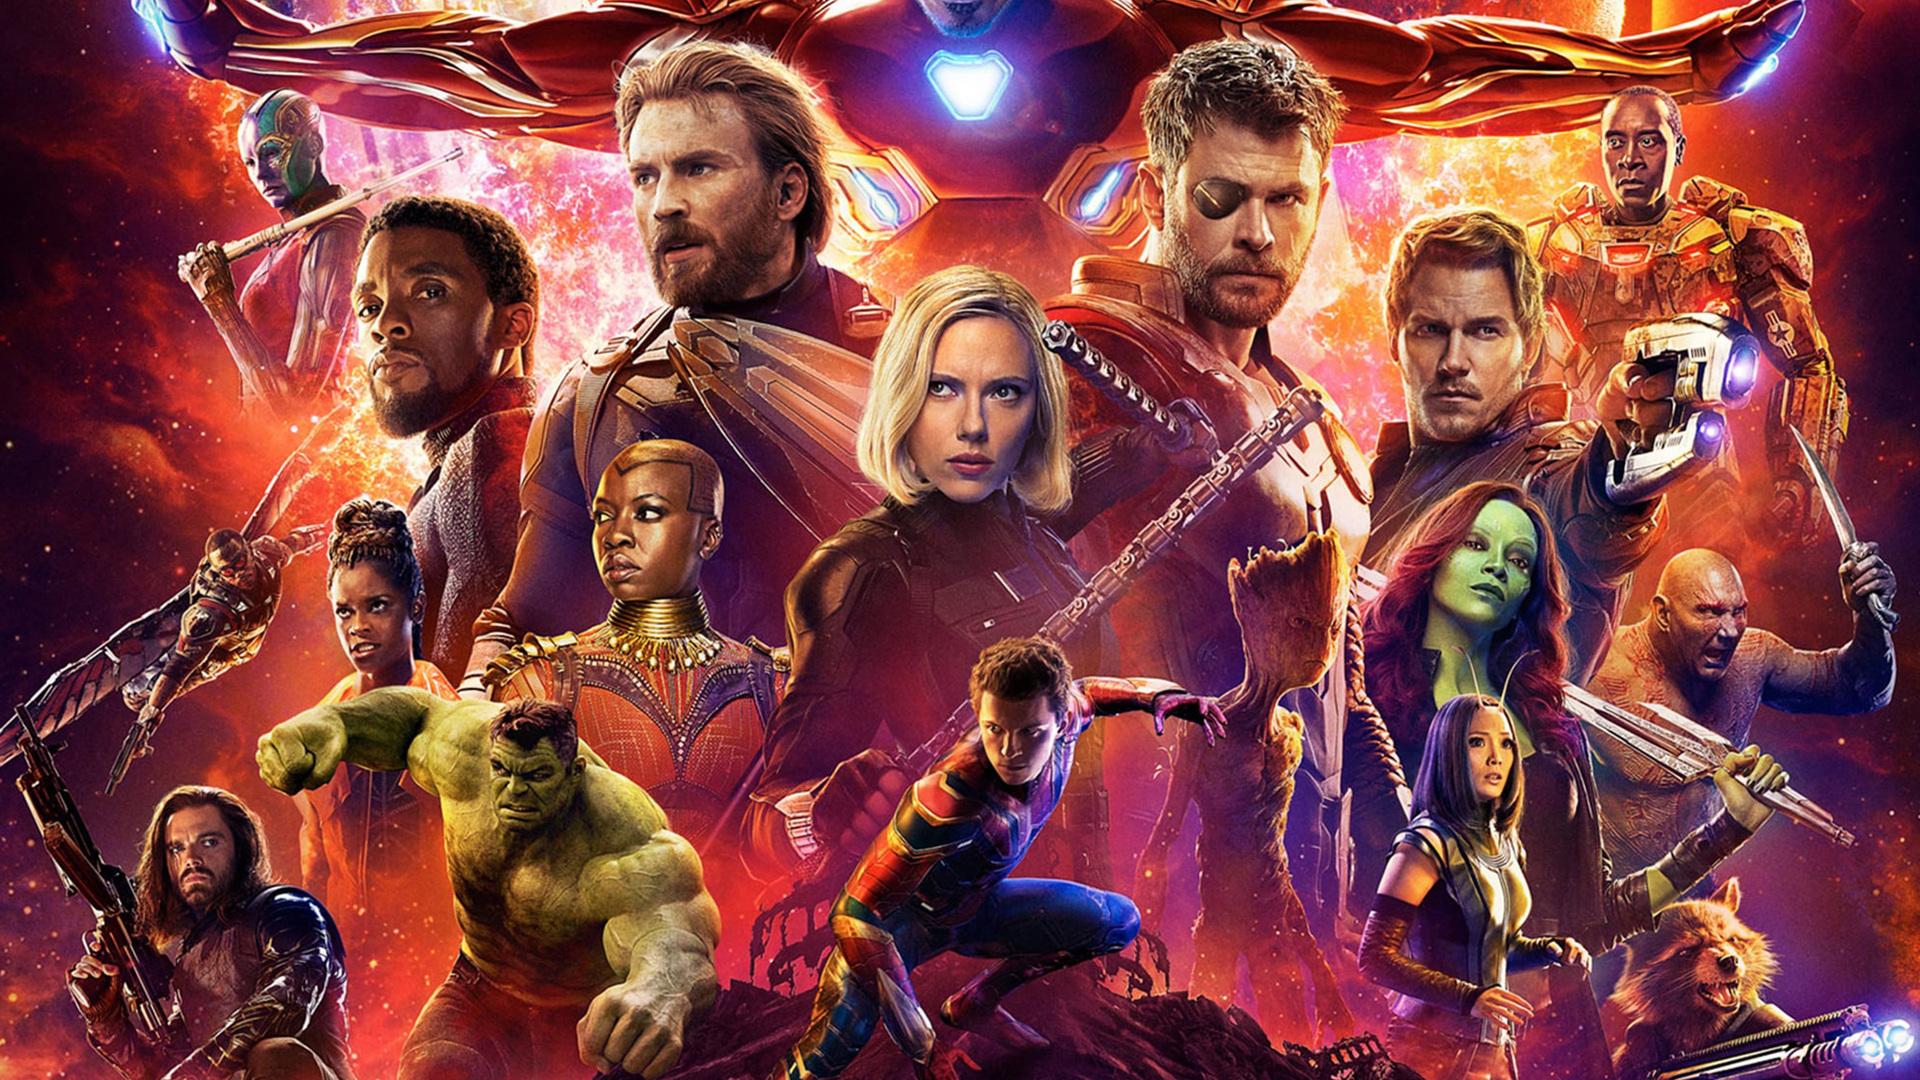 1920x1080 Avengers Infinity War 2018 Poster 4k Laptop Full Hd 1080p